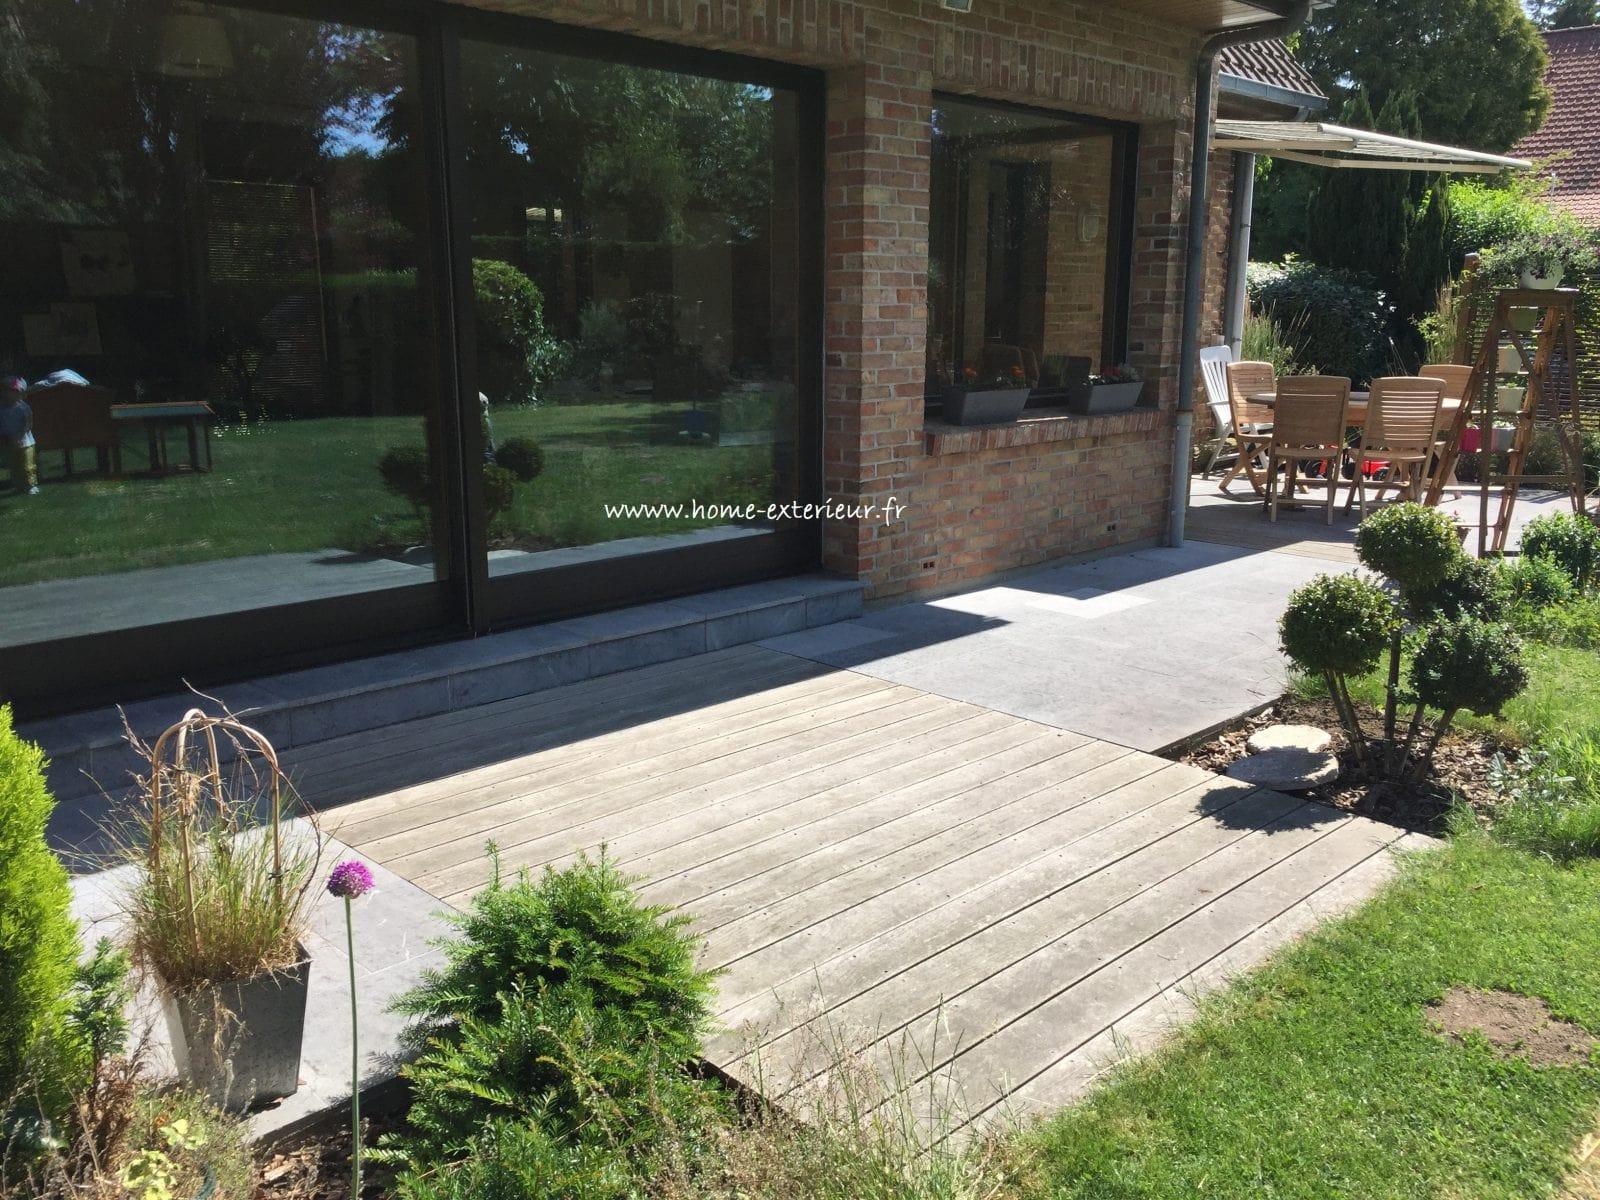 terrasse pierre bleue et bois exotique verlinghem lille 59 nord architecte paysagiste. Black Bedroom Furniture Sets. Home Design Ideas